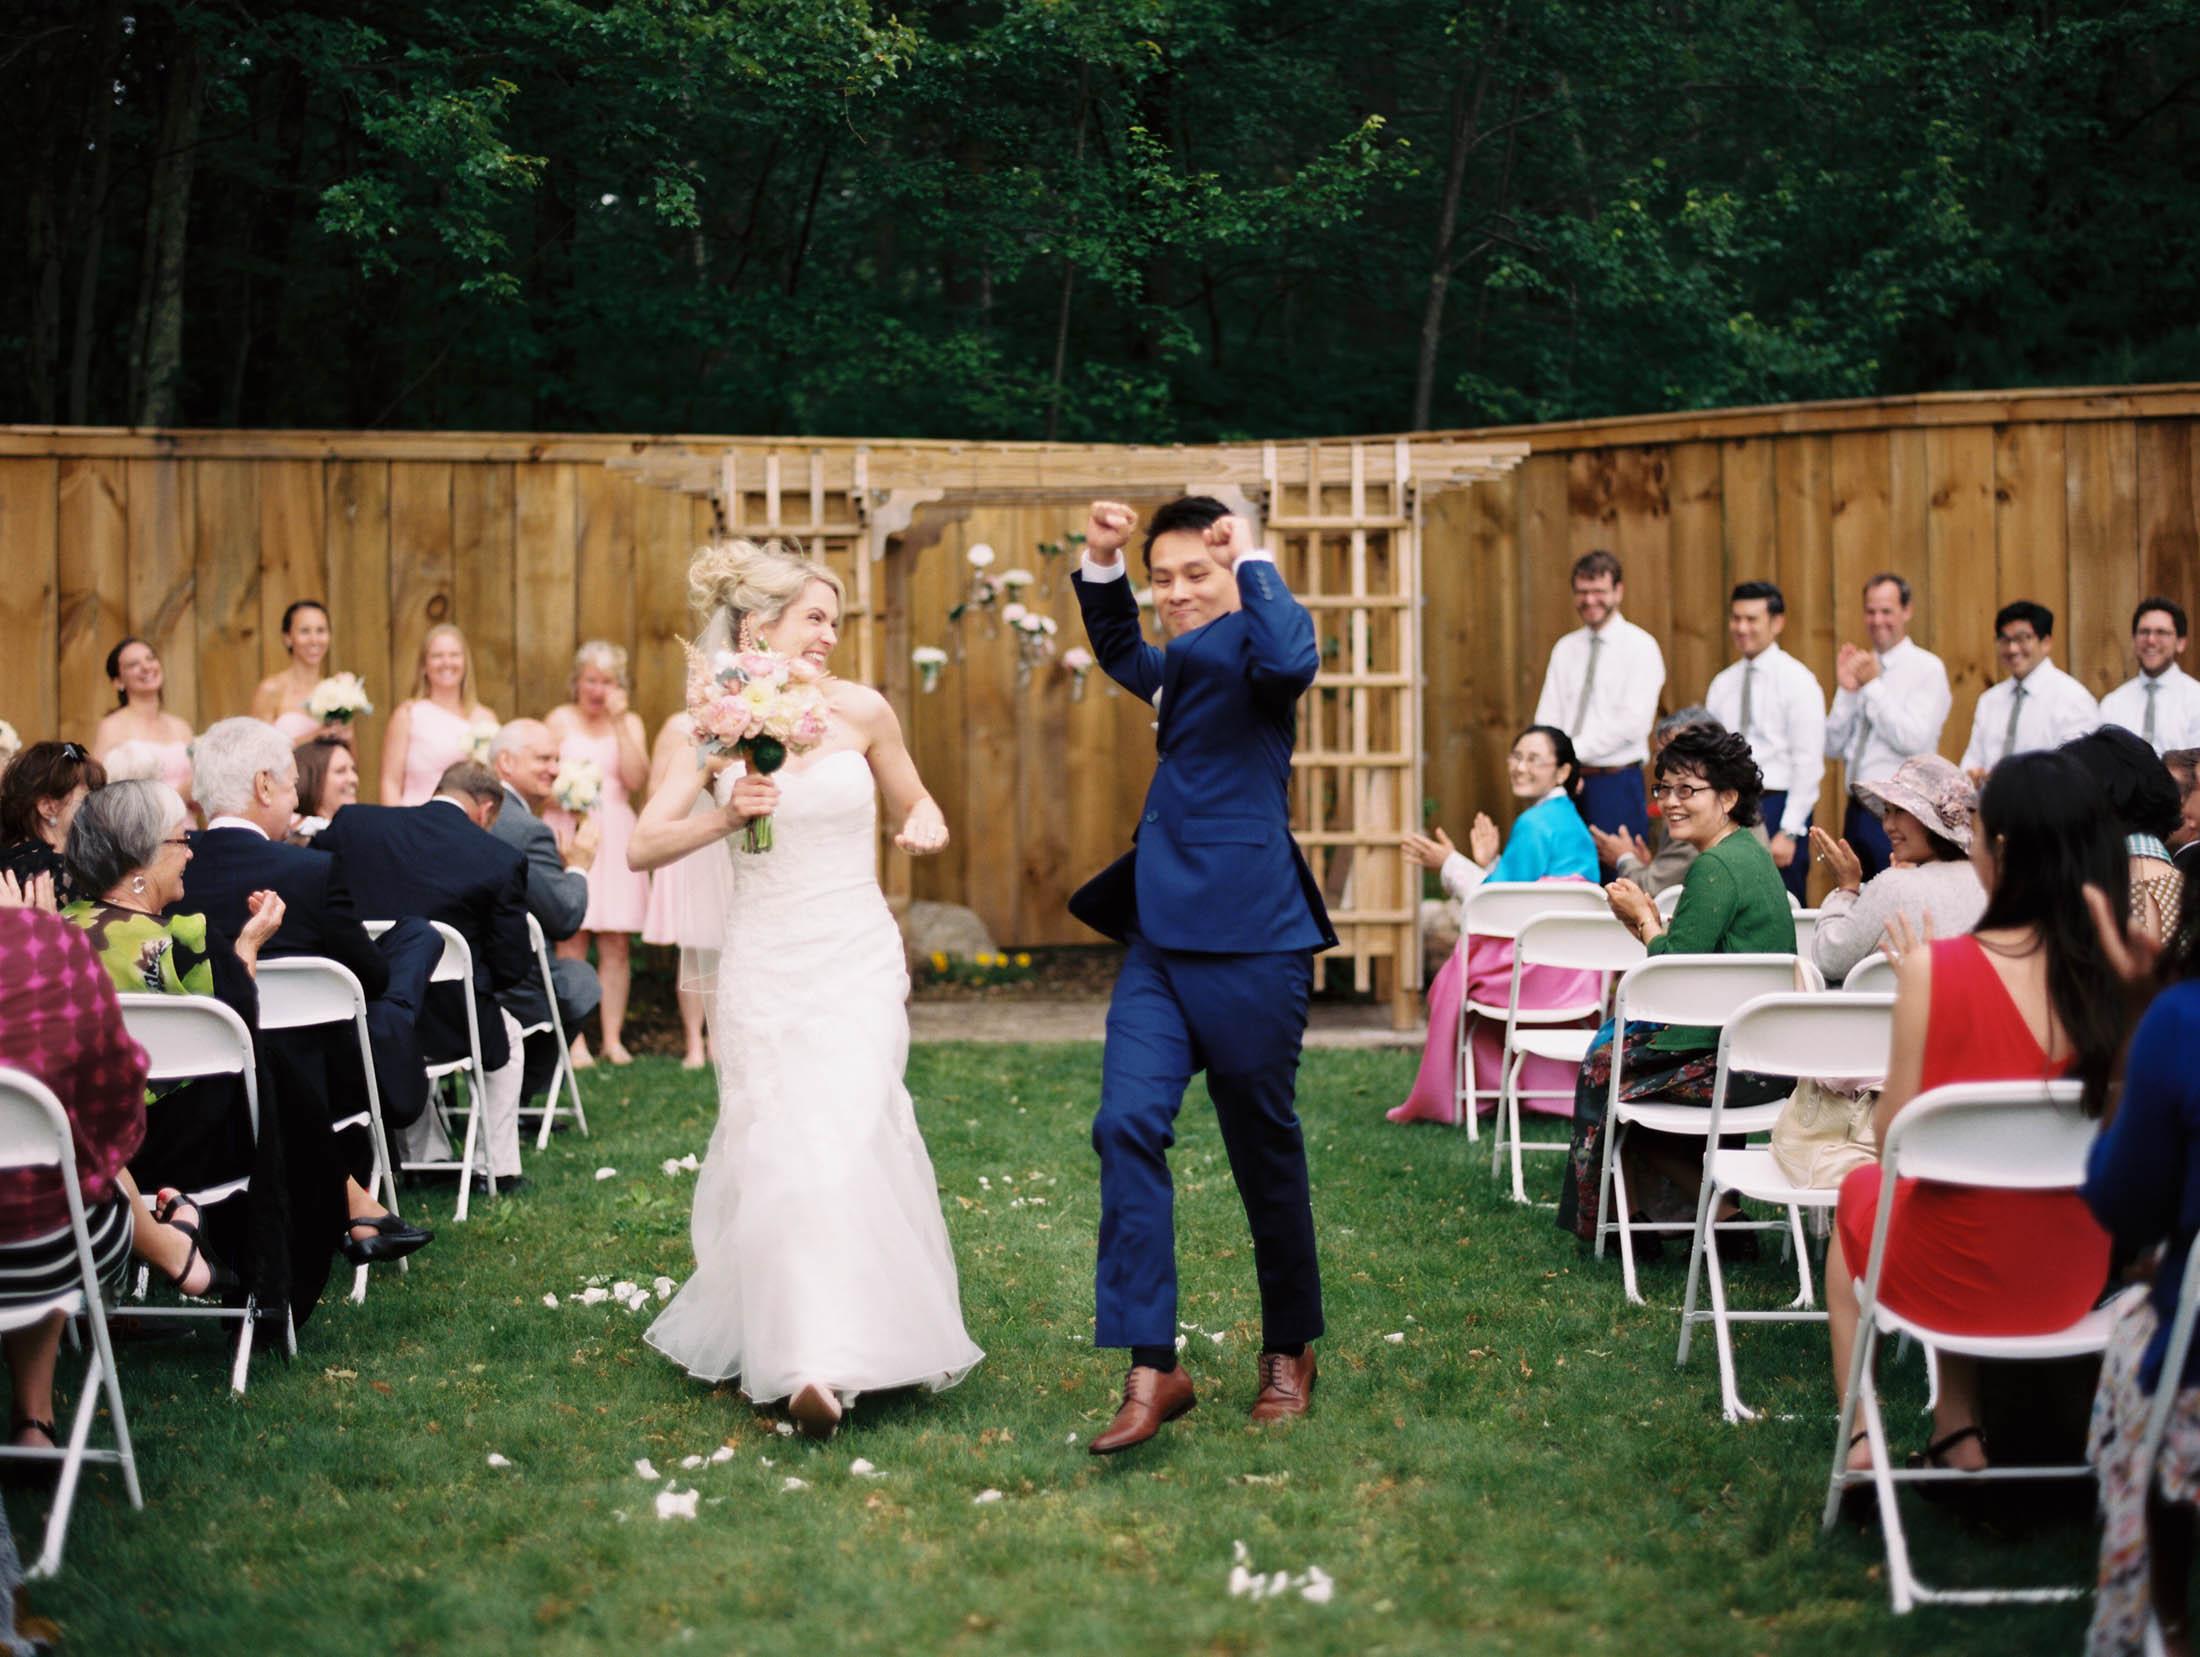 Blissful-Meadows-wedding-10.jpg